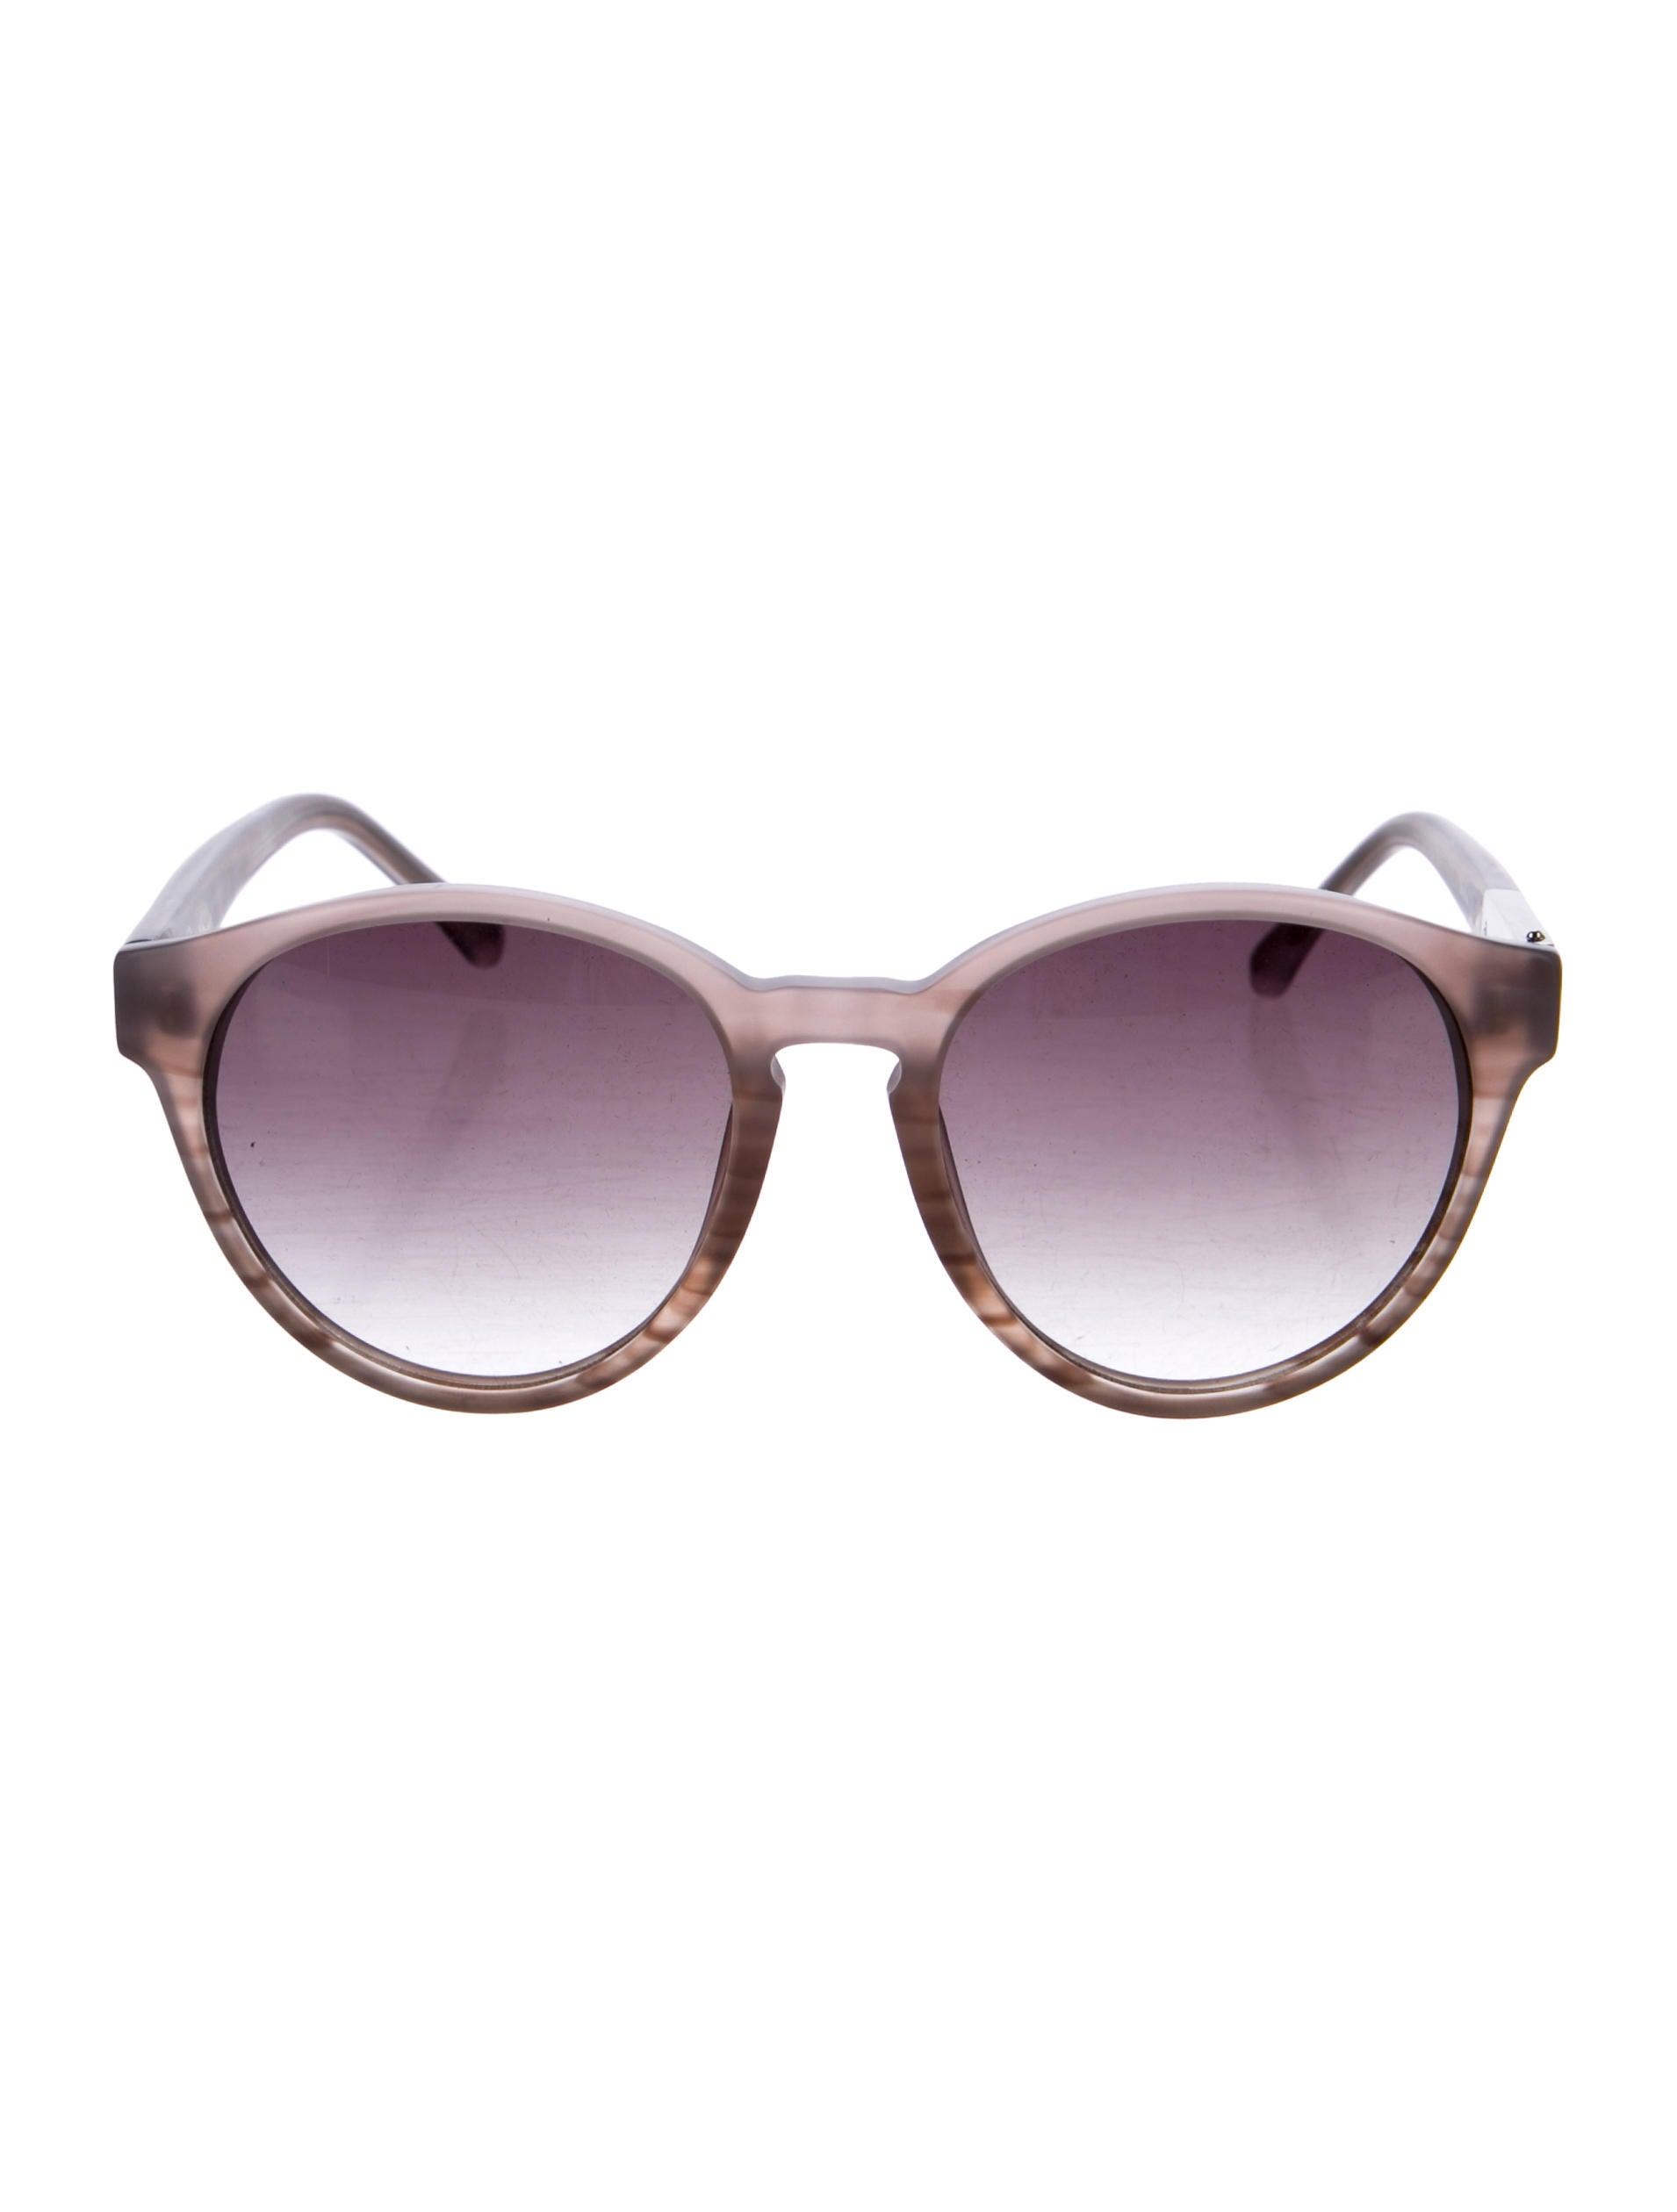 d3657bc9e80 3.1 Phillip Lim Circle Gradient Sunglasses - Accessories ...